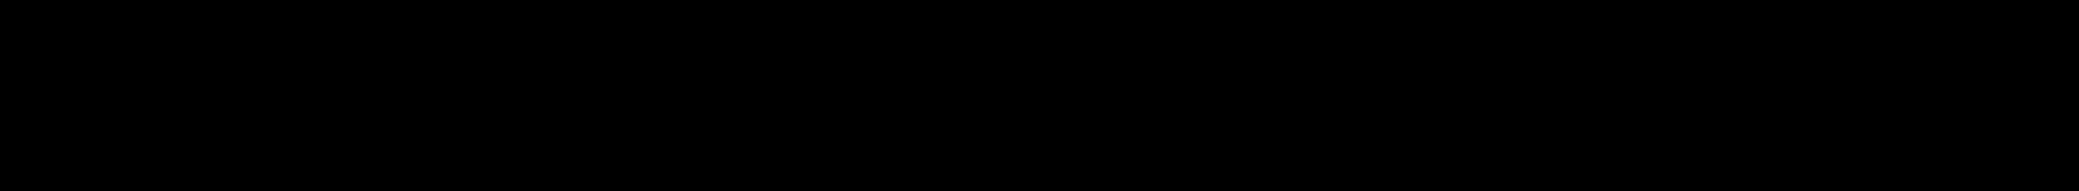 Cavole Slab Black Italic